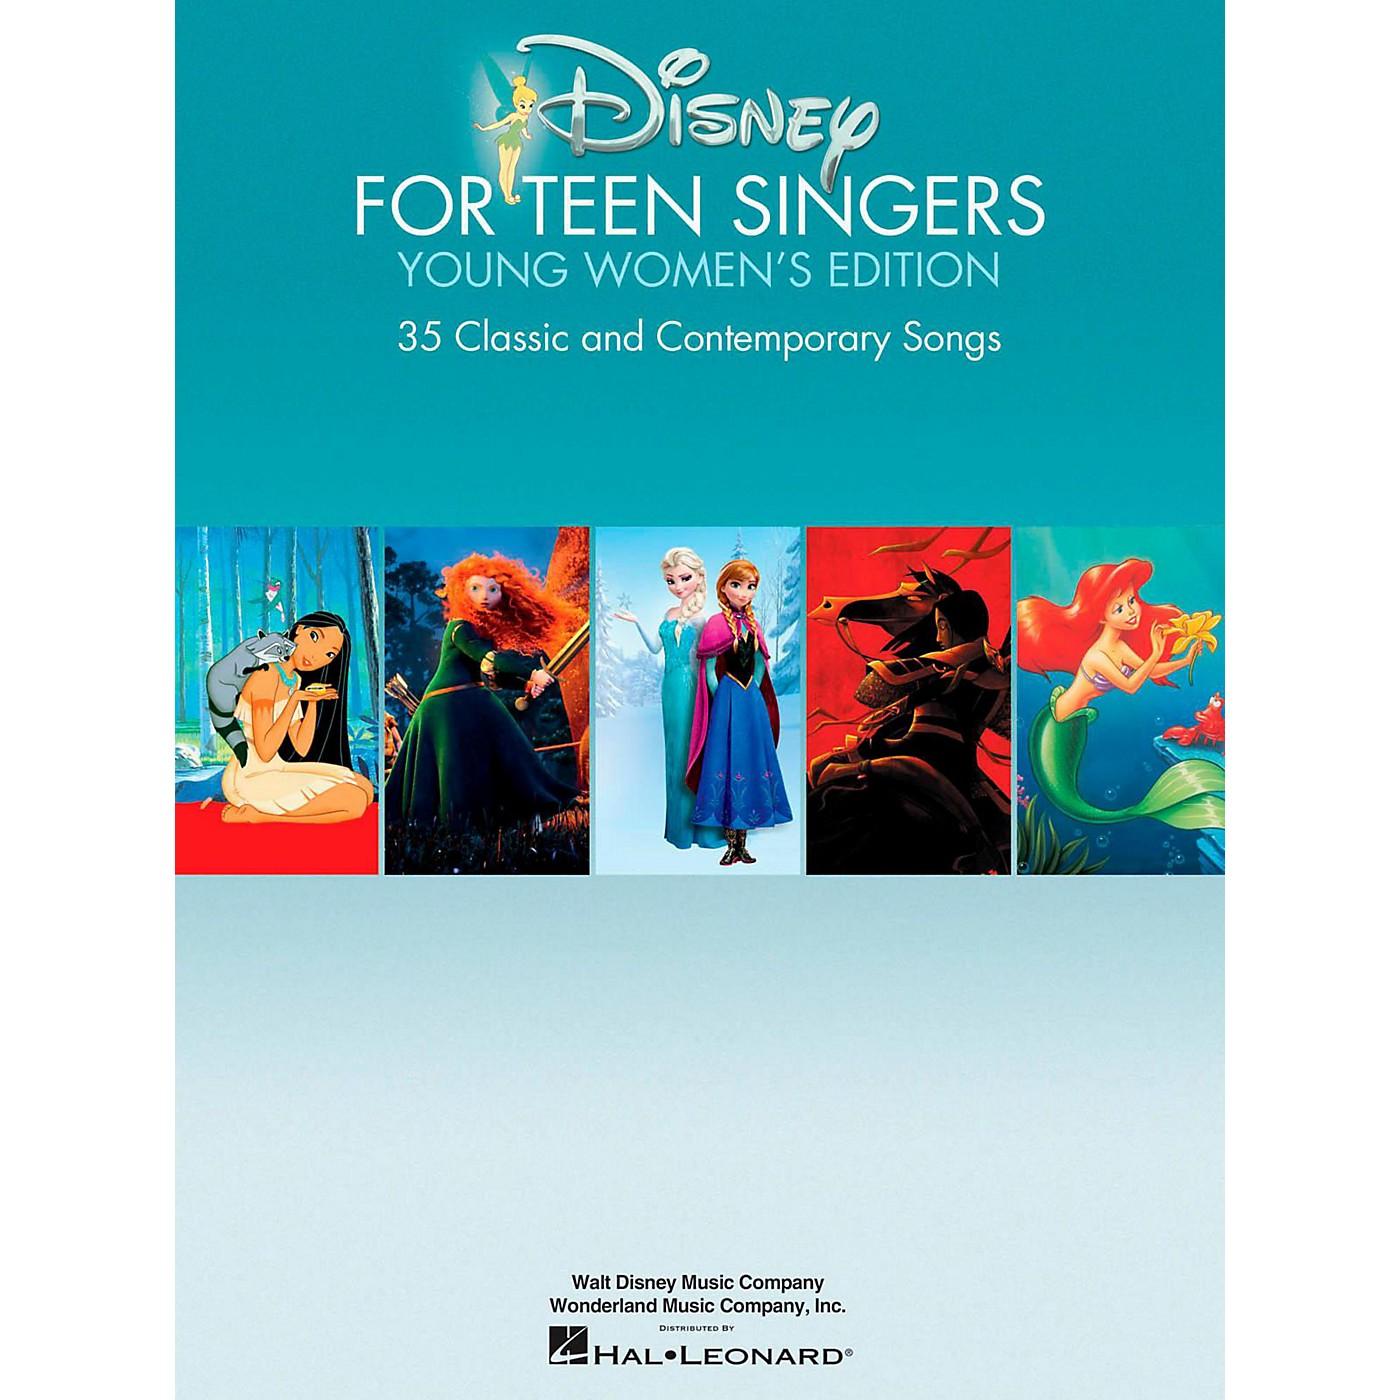 Hal Leonard Disney For Teen Singers - Young Women's Edition thumbnail